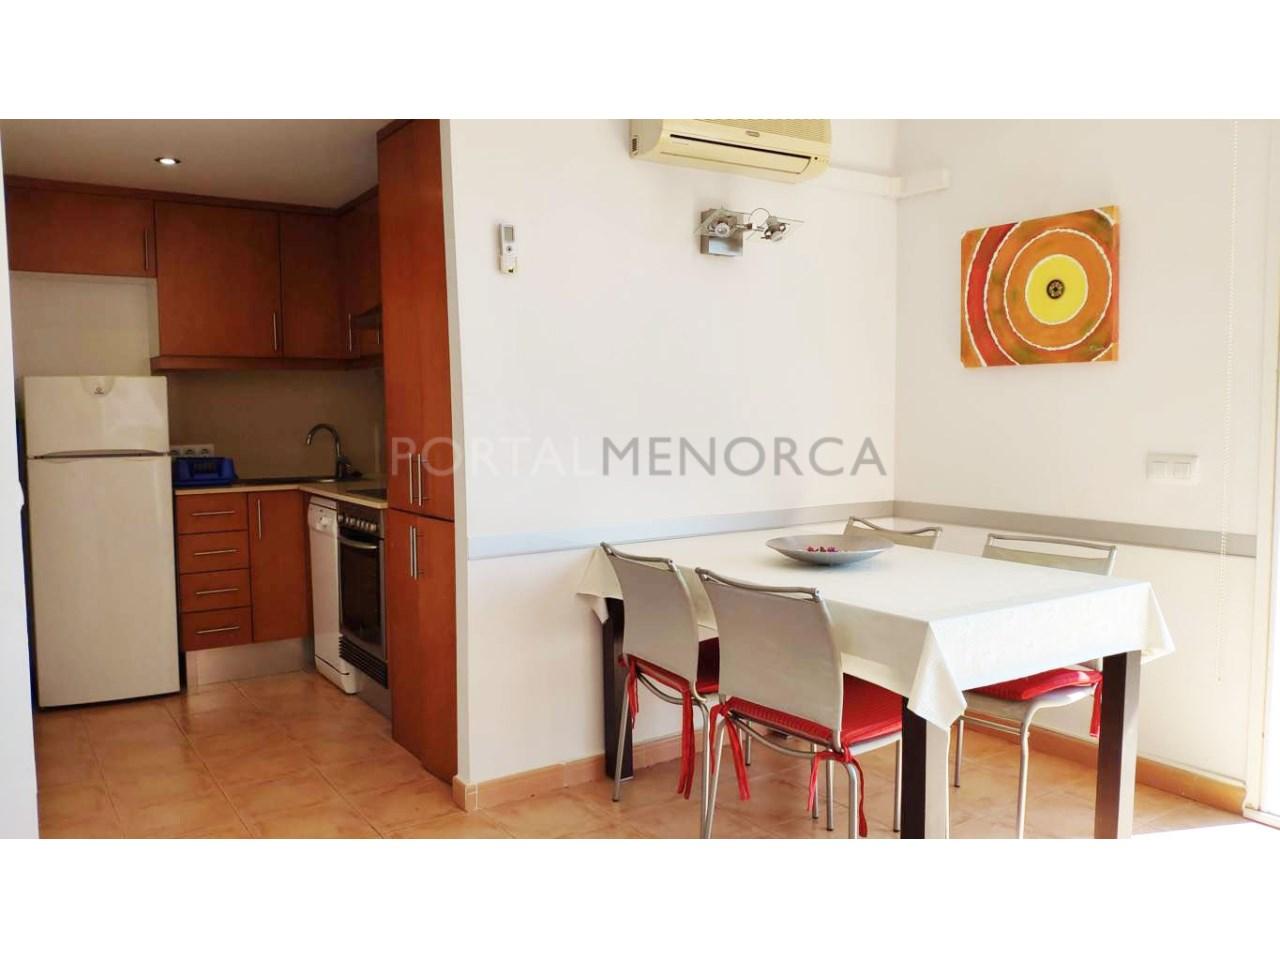 Frist floor apartament for sale in Ciutadella-Dinning room